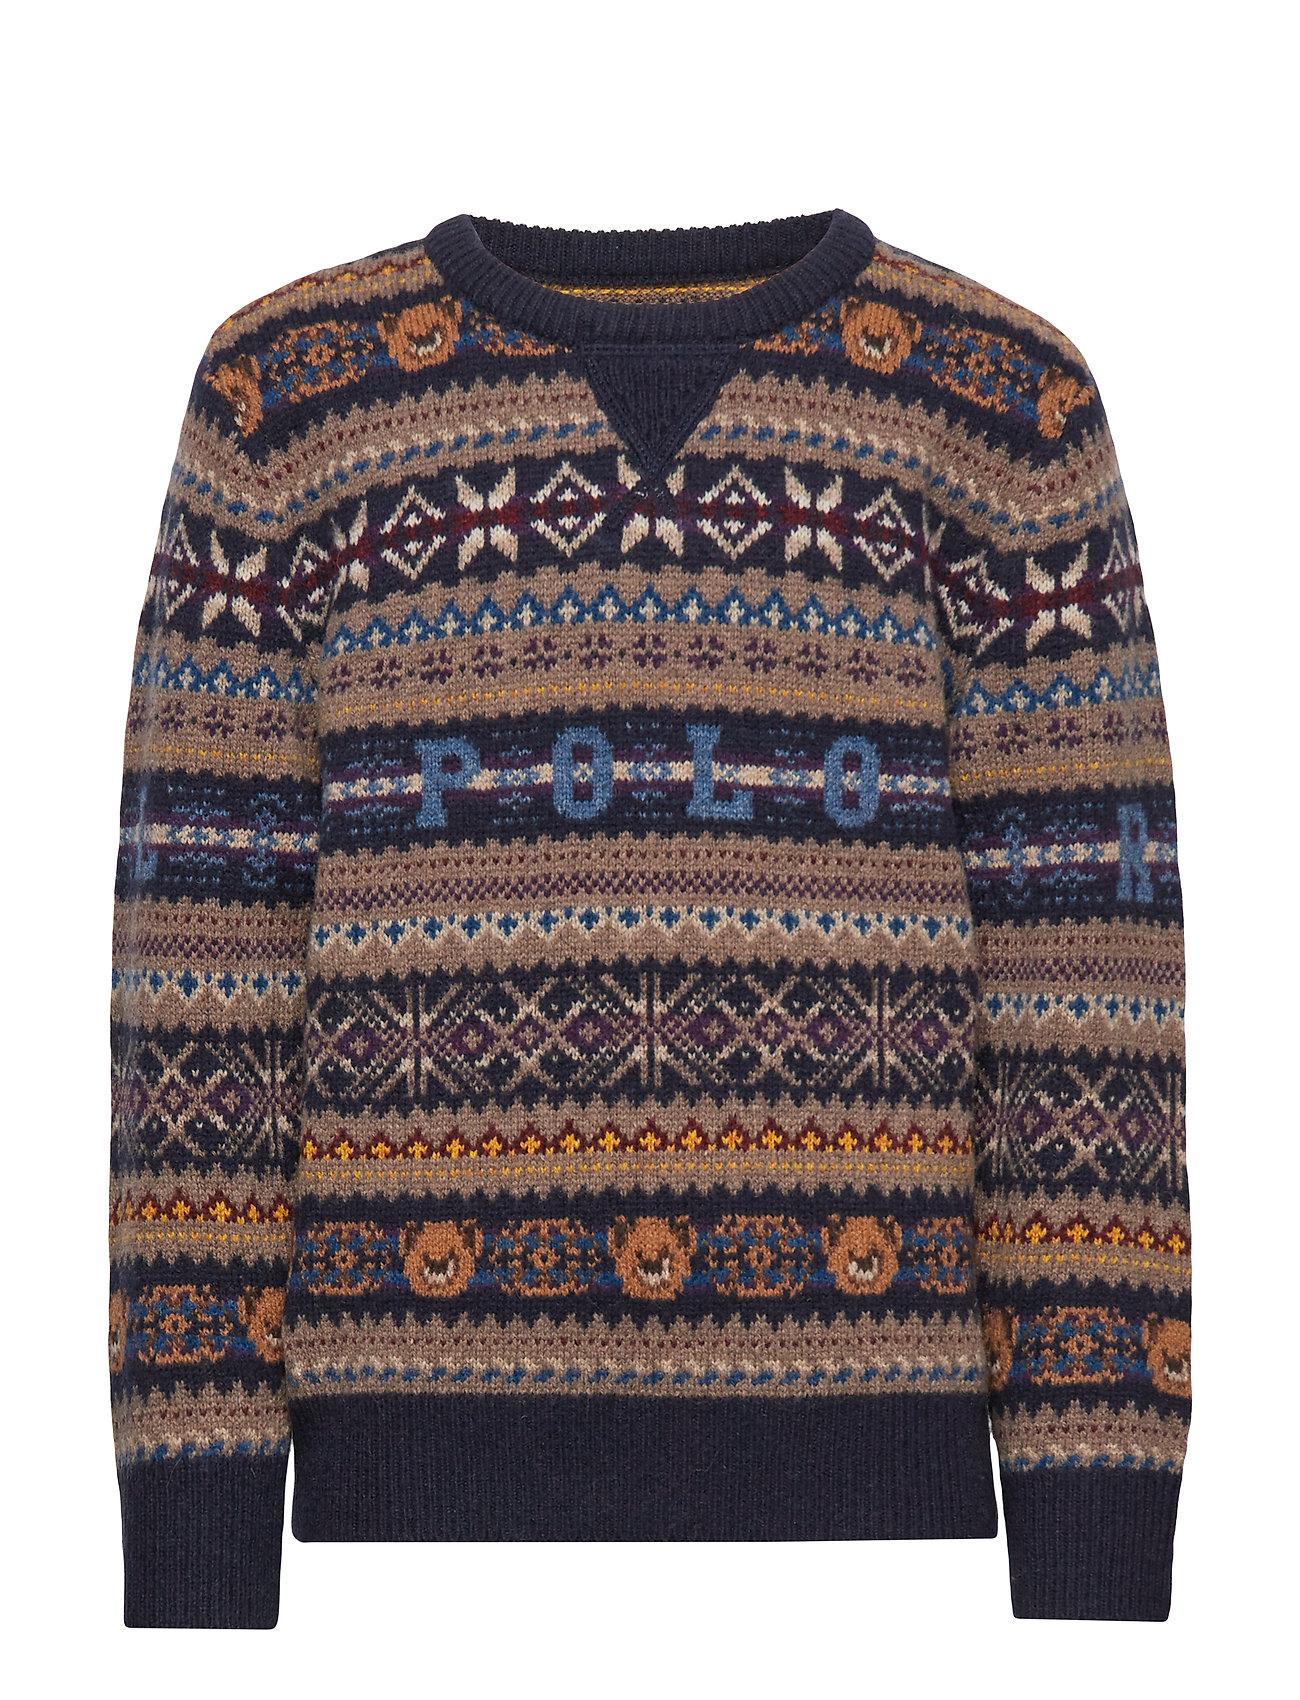 Ralph Lauren Kids Bear Fair Isle Sweater - RL NAVY MULTI